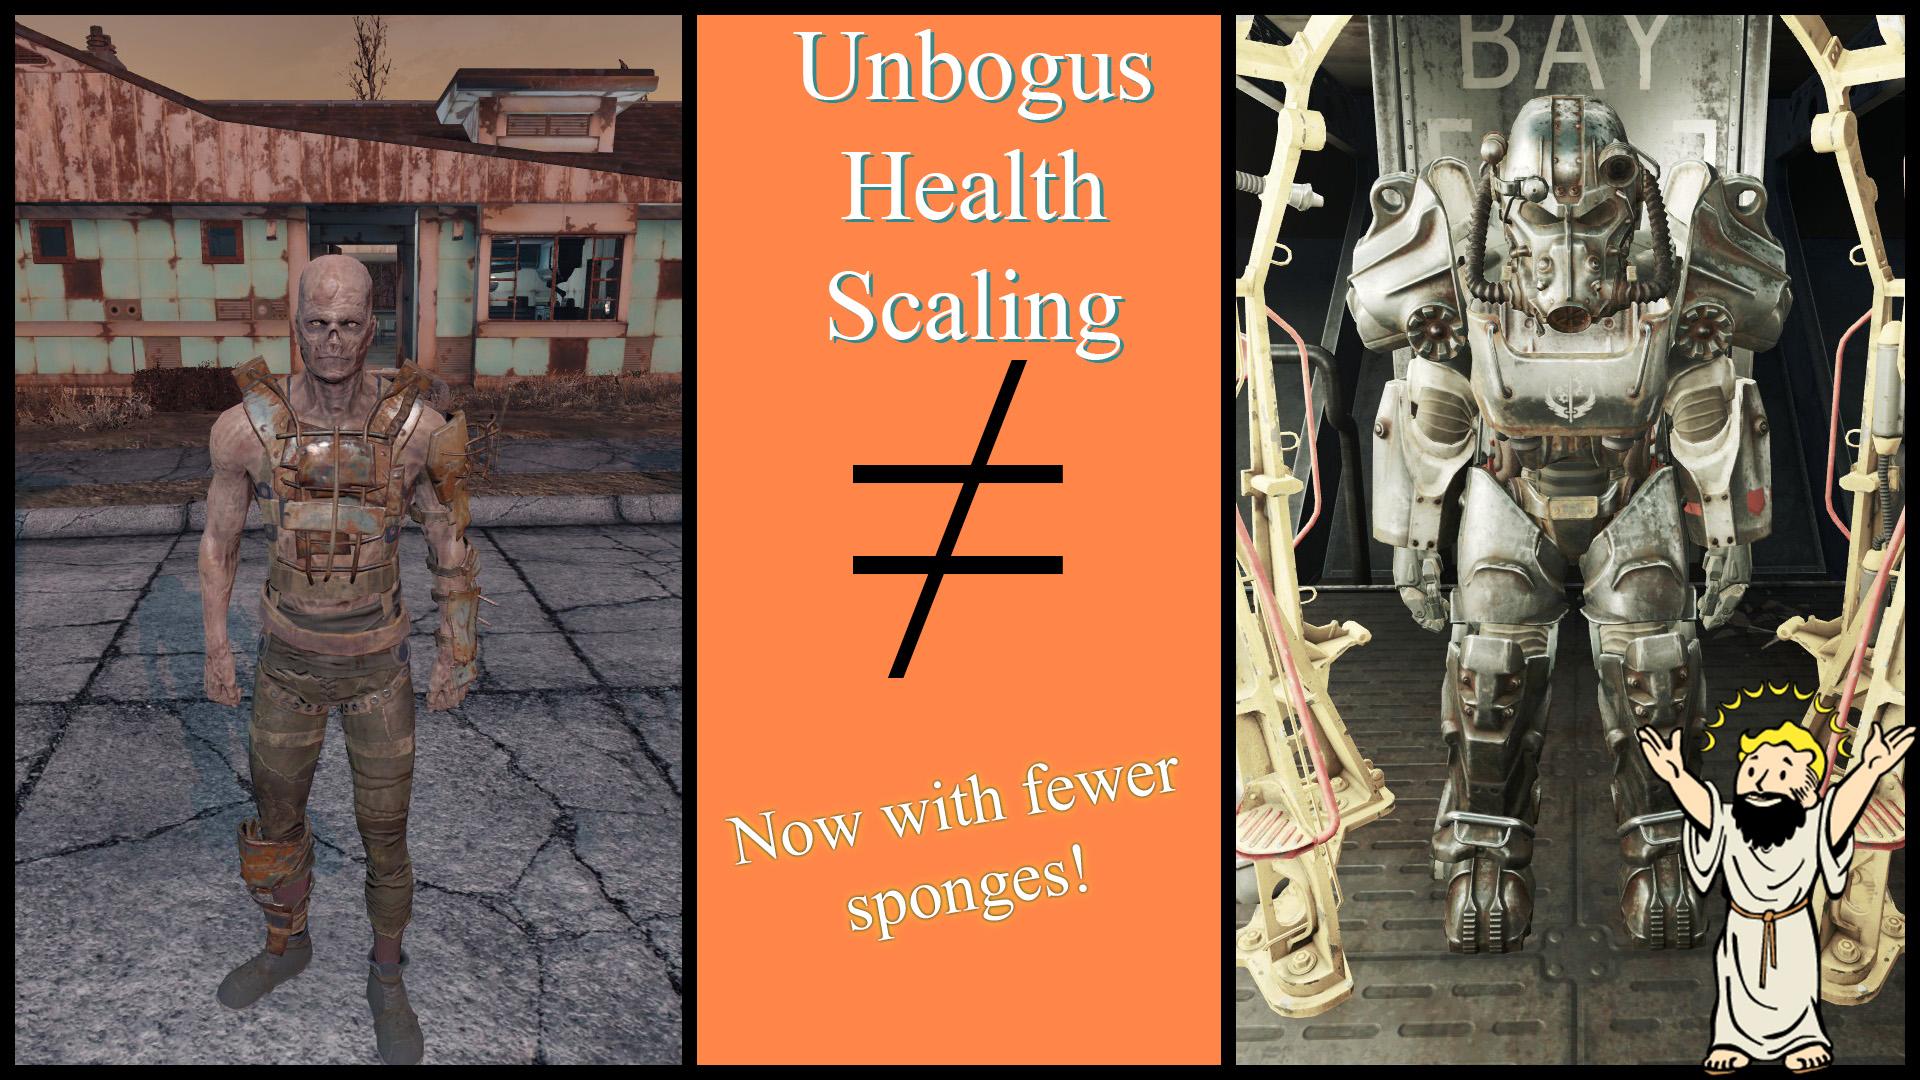 Unbogus Health Scaling